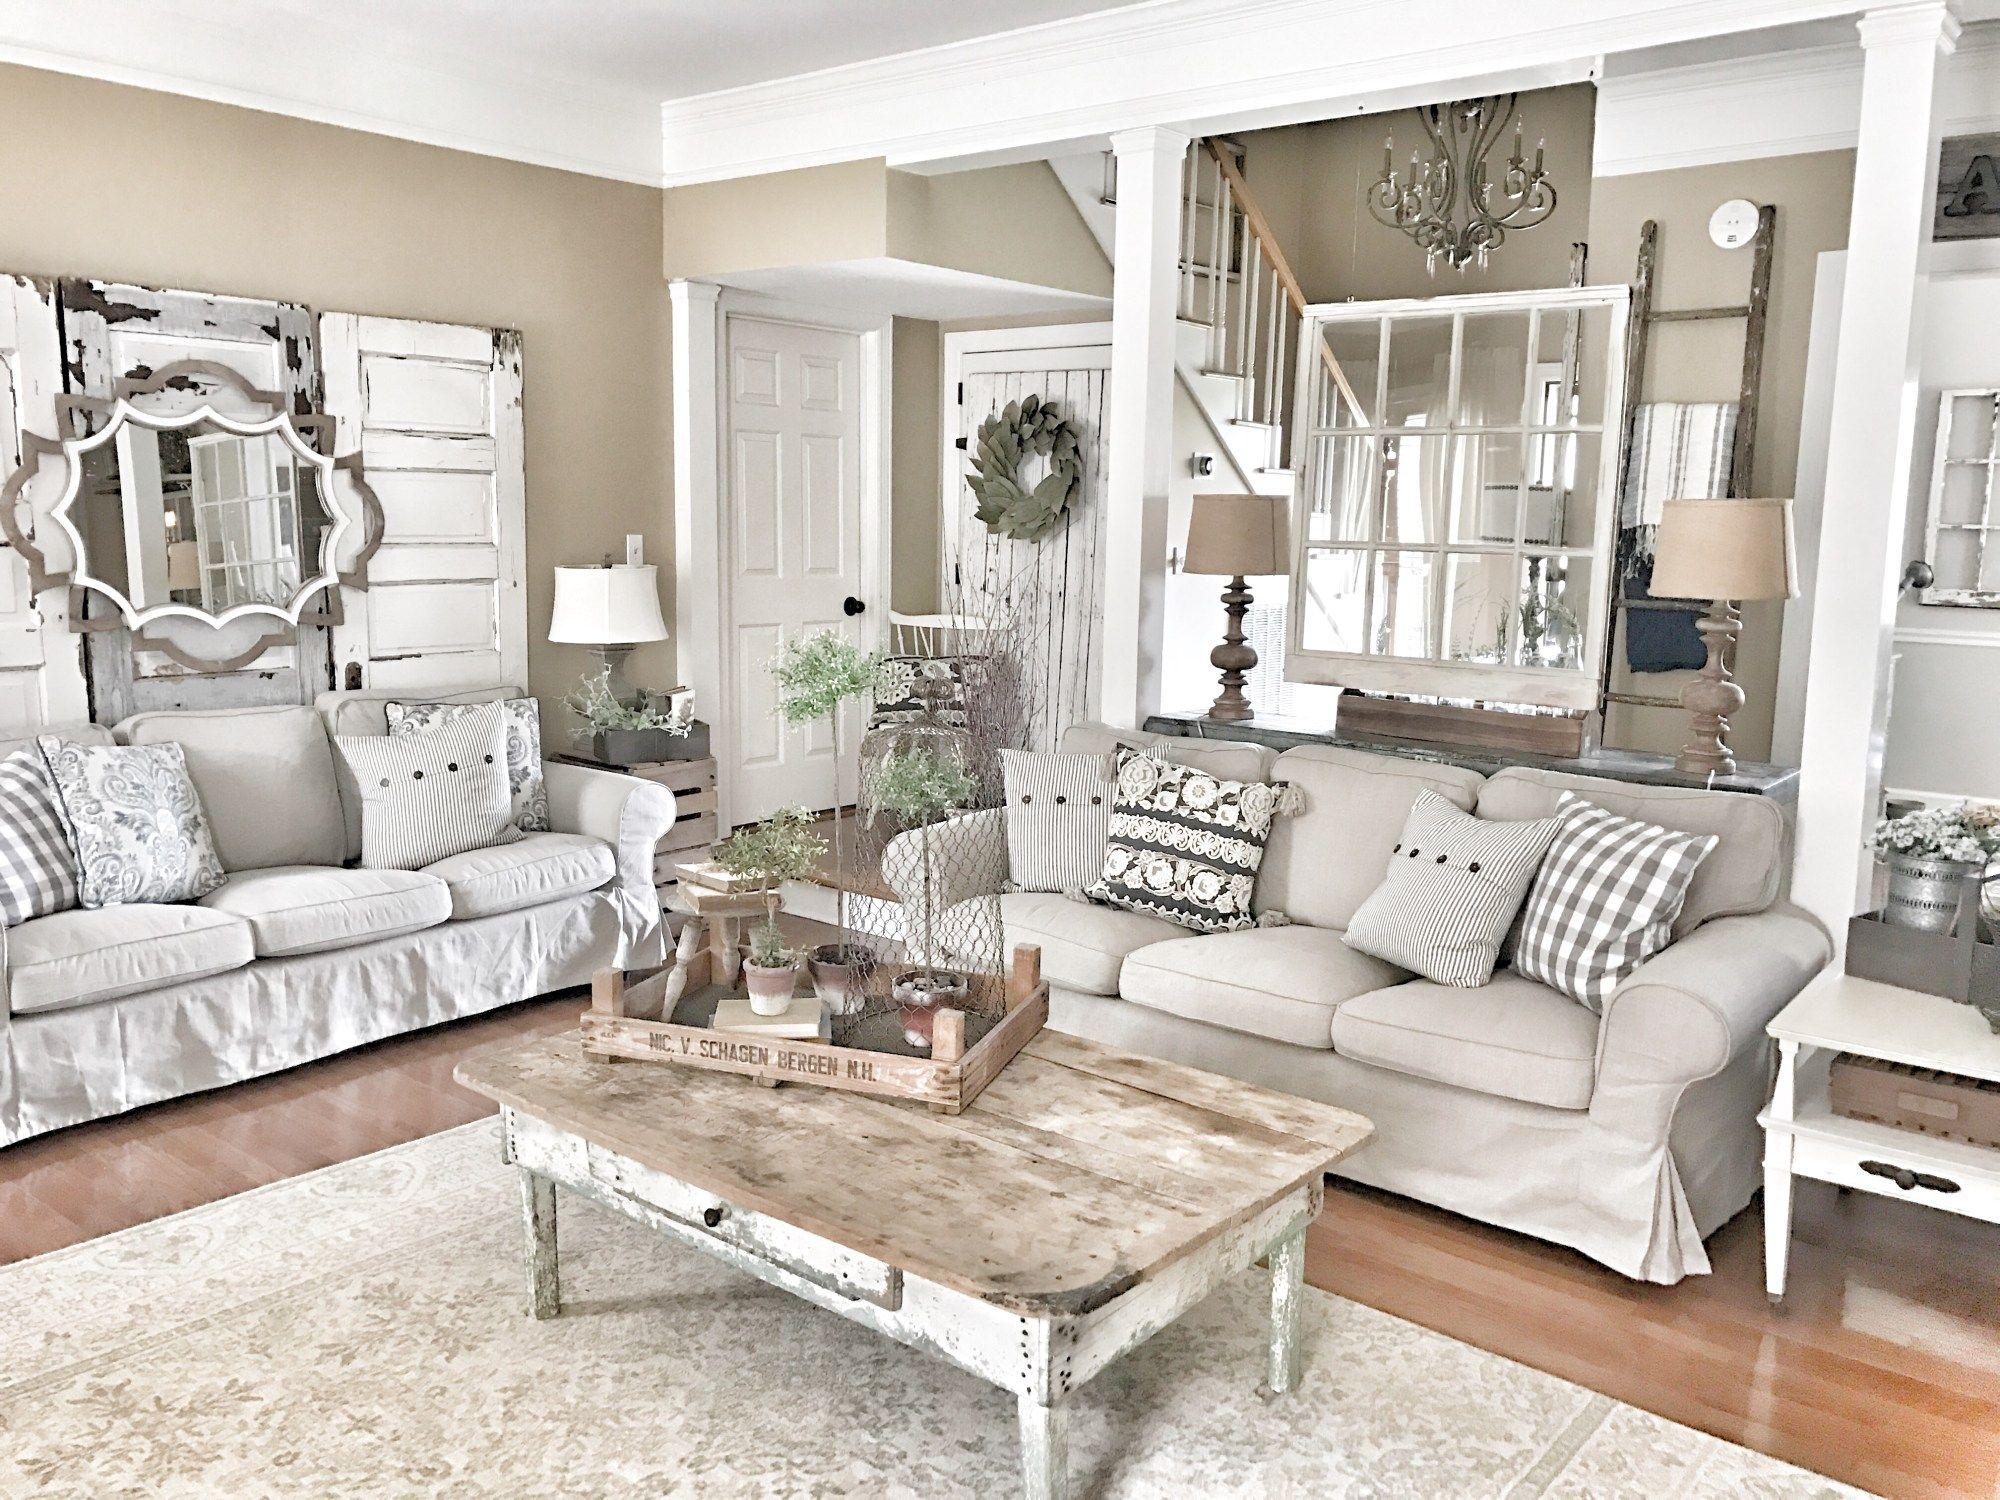 Living Room - Bless This Nest